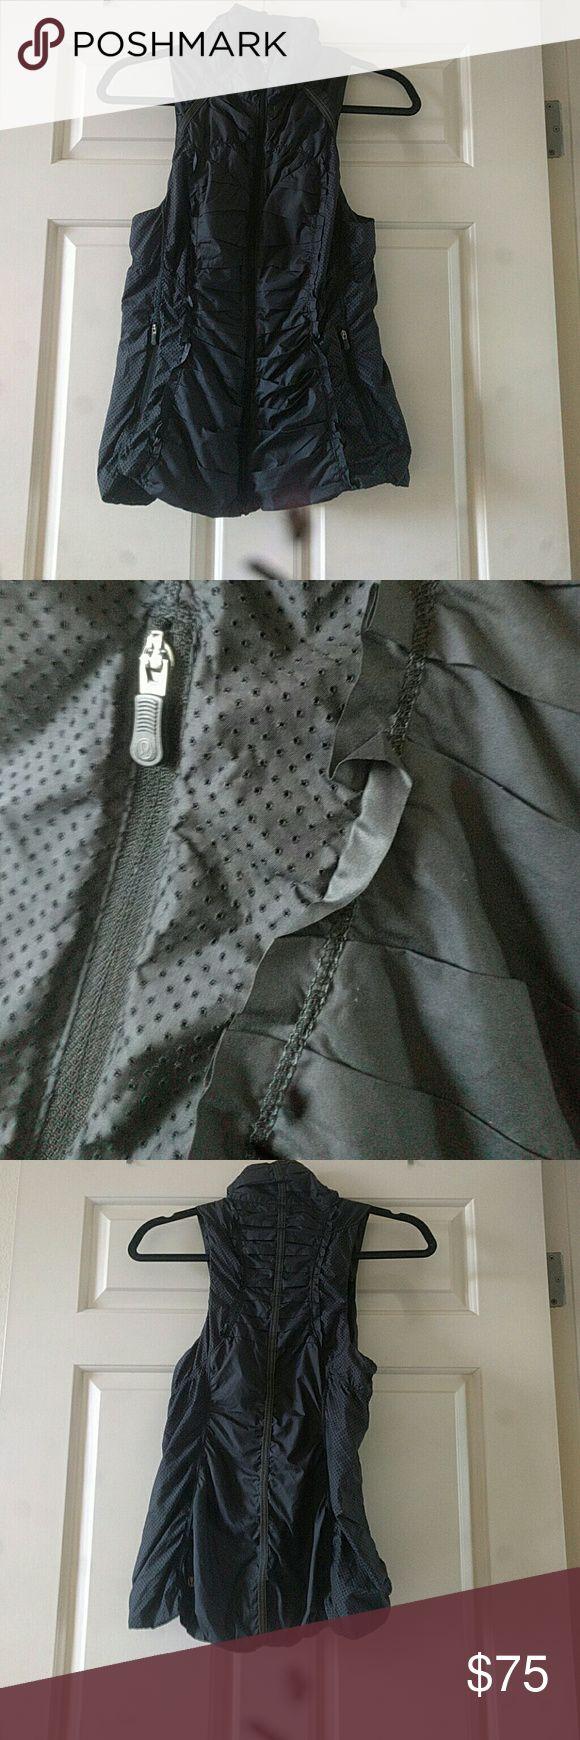 Lululemon vest Black light weight vest, lululeMon size 4, gorgeous details of pleats and texture, pockets on the sides lululemon athletica Tops